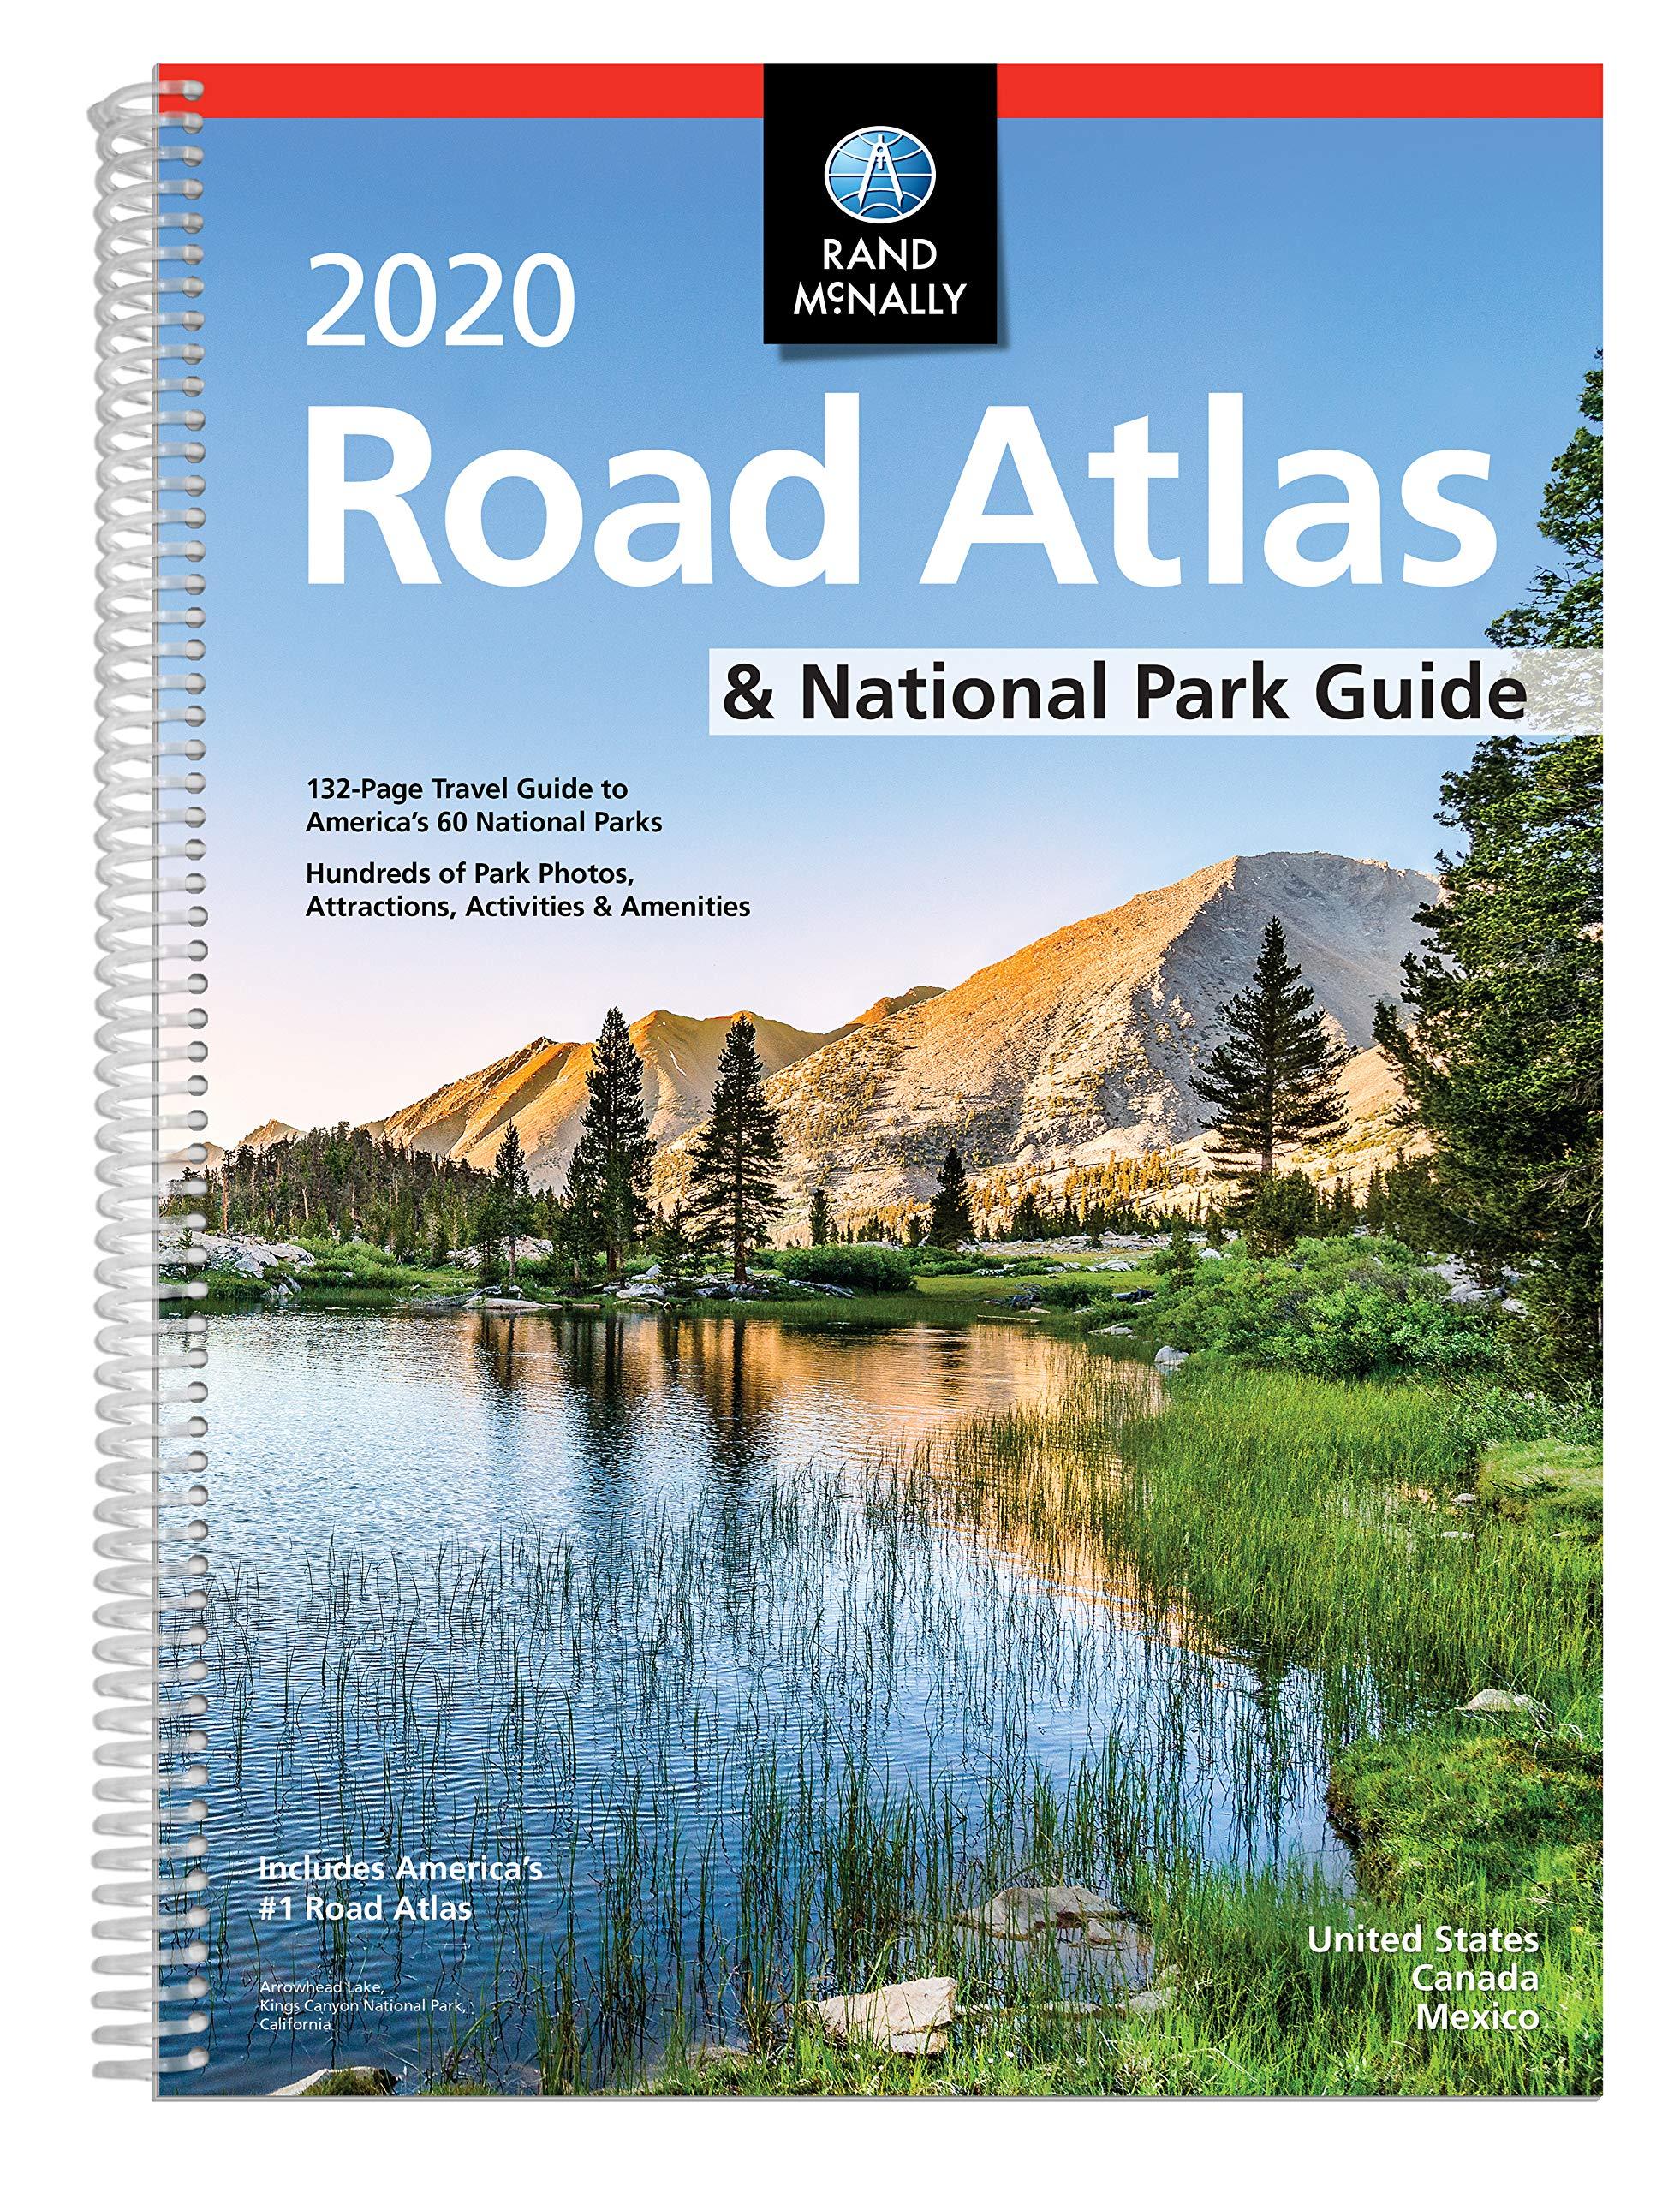 Rand McNally 2020 National Park Atlas & Guide by Rand McNally